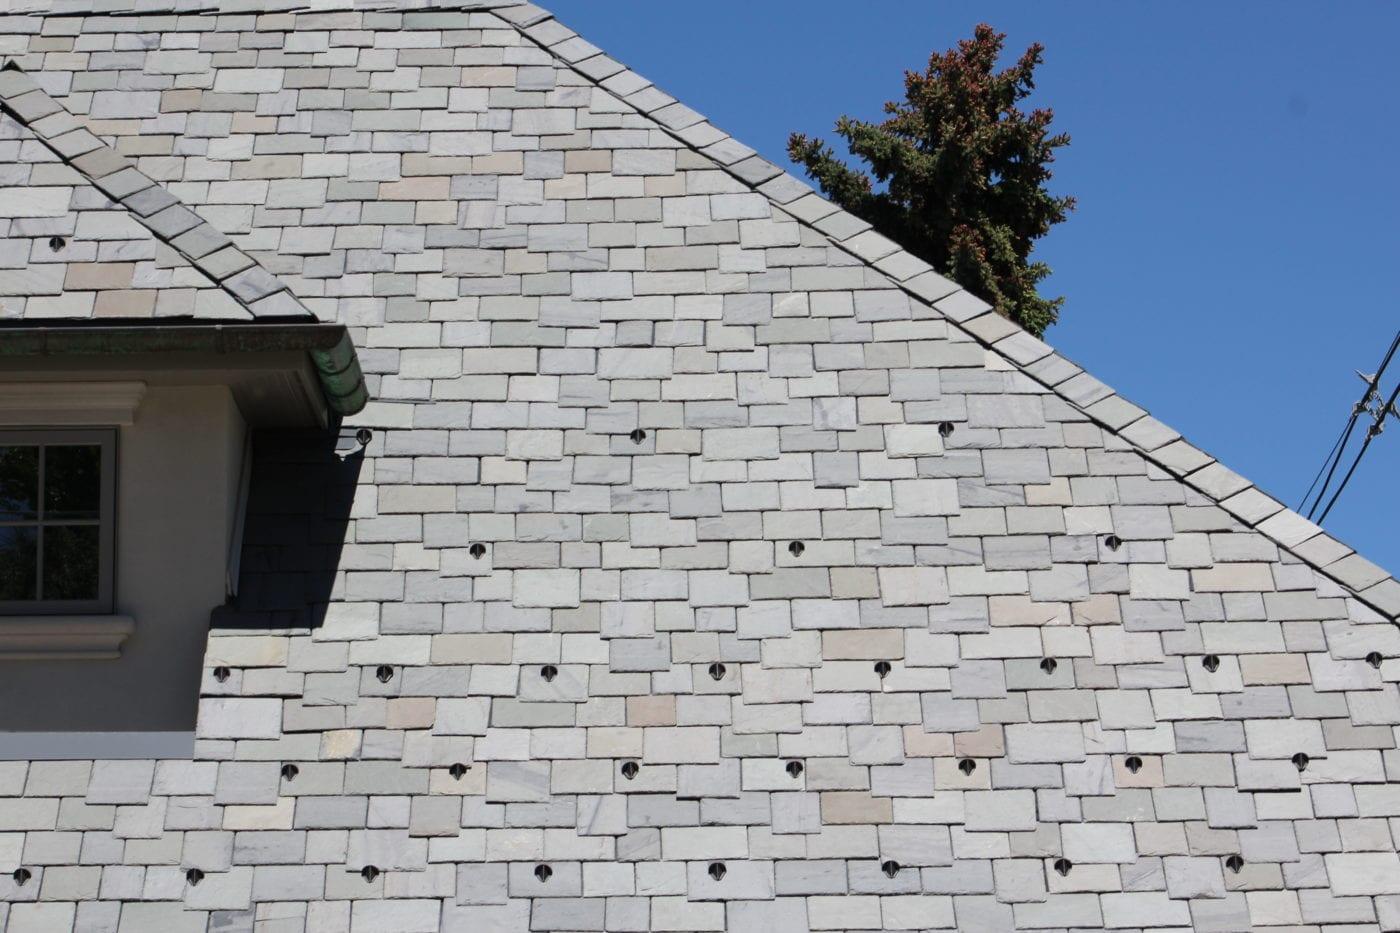 SlateTec - Lightweight Slate Roof System